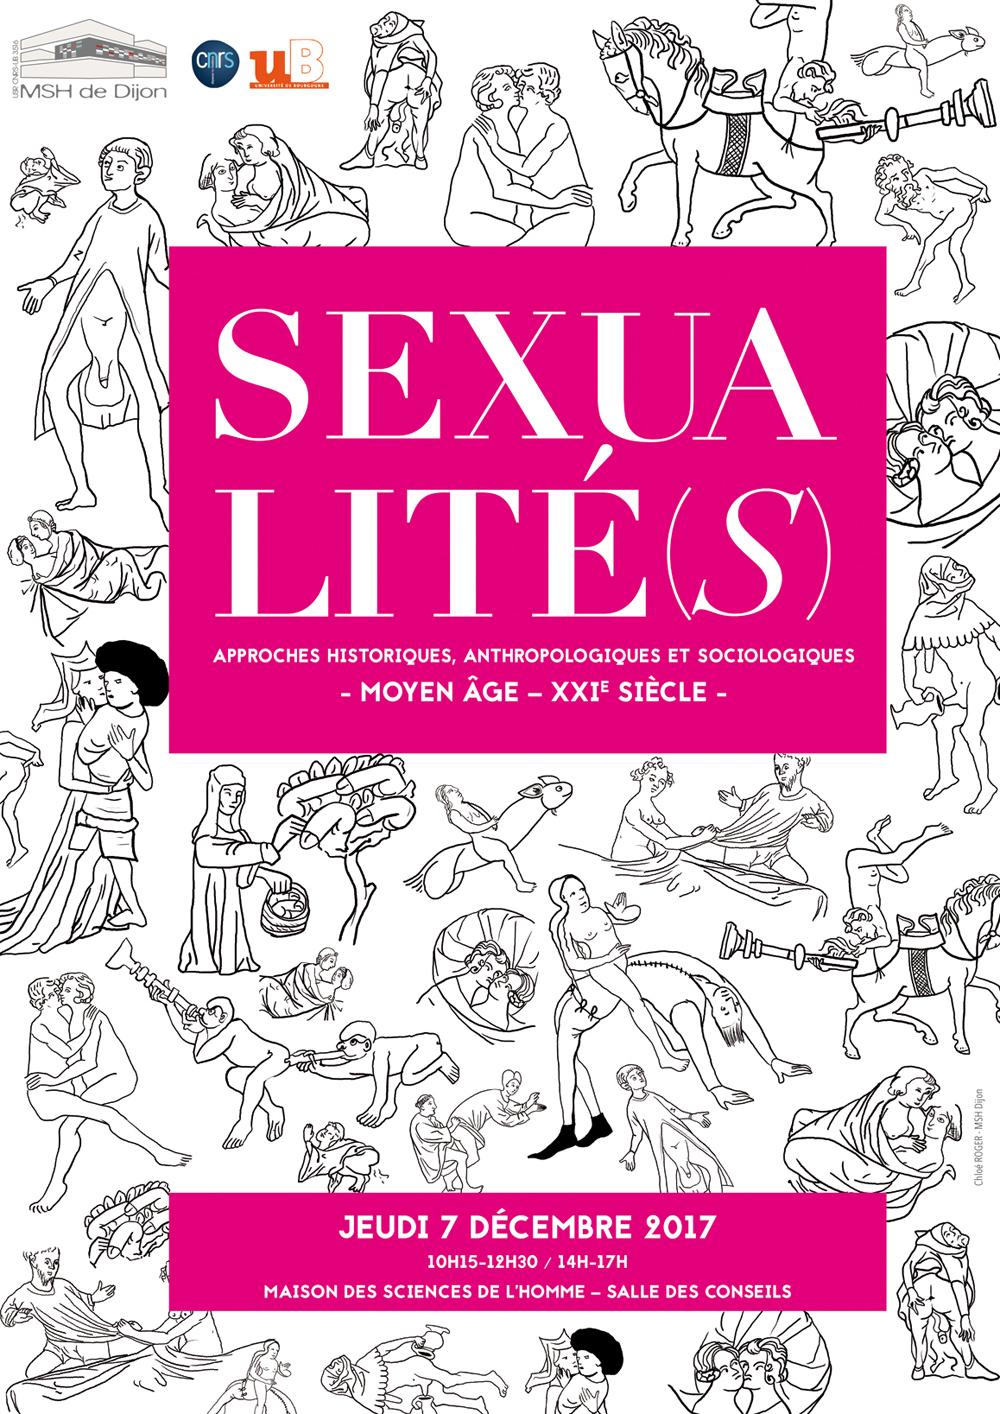 sexualites A3 nov17